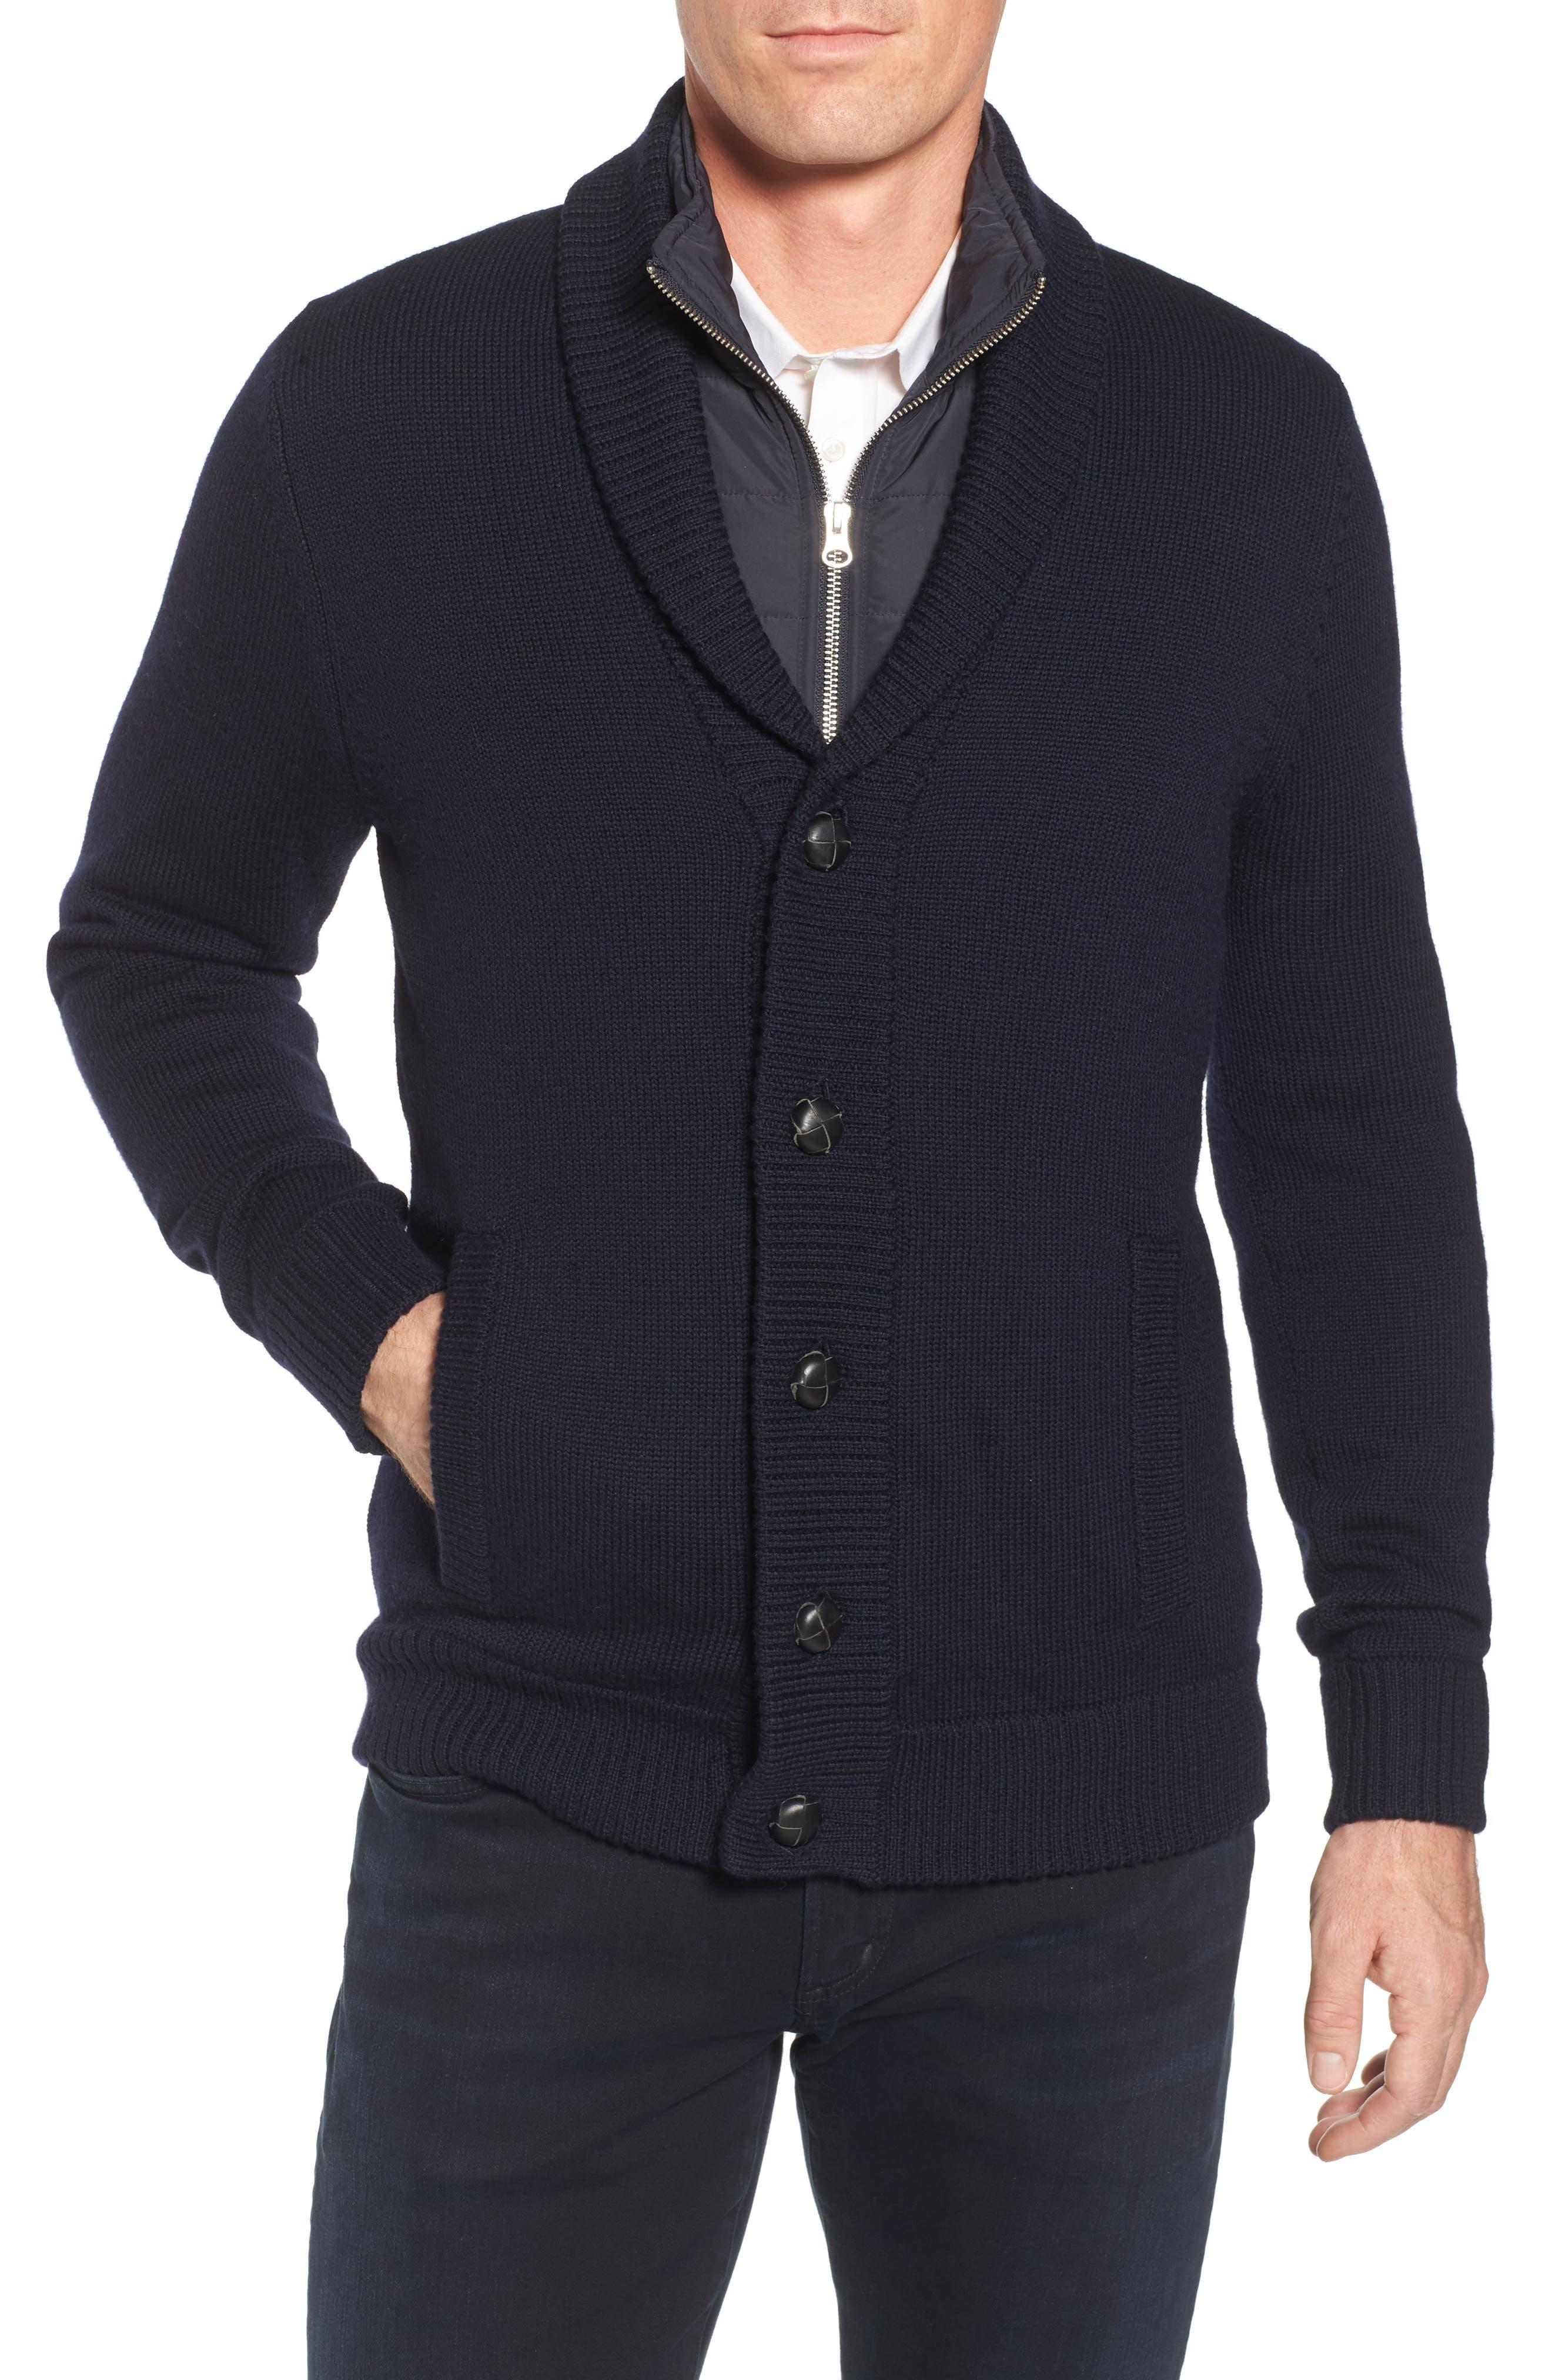 Wool Cardigan with Bib,                         Main,                         color, Navy Night